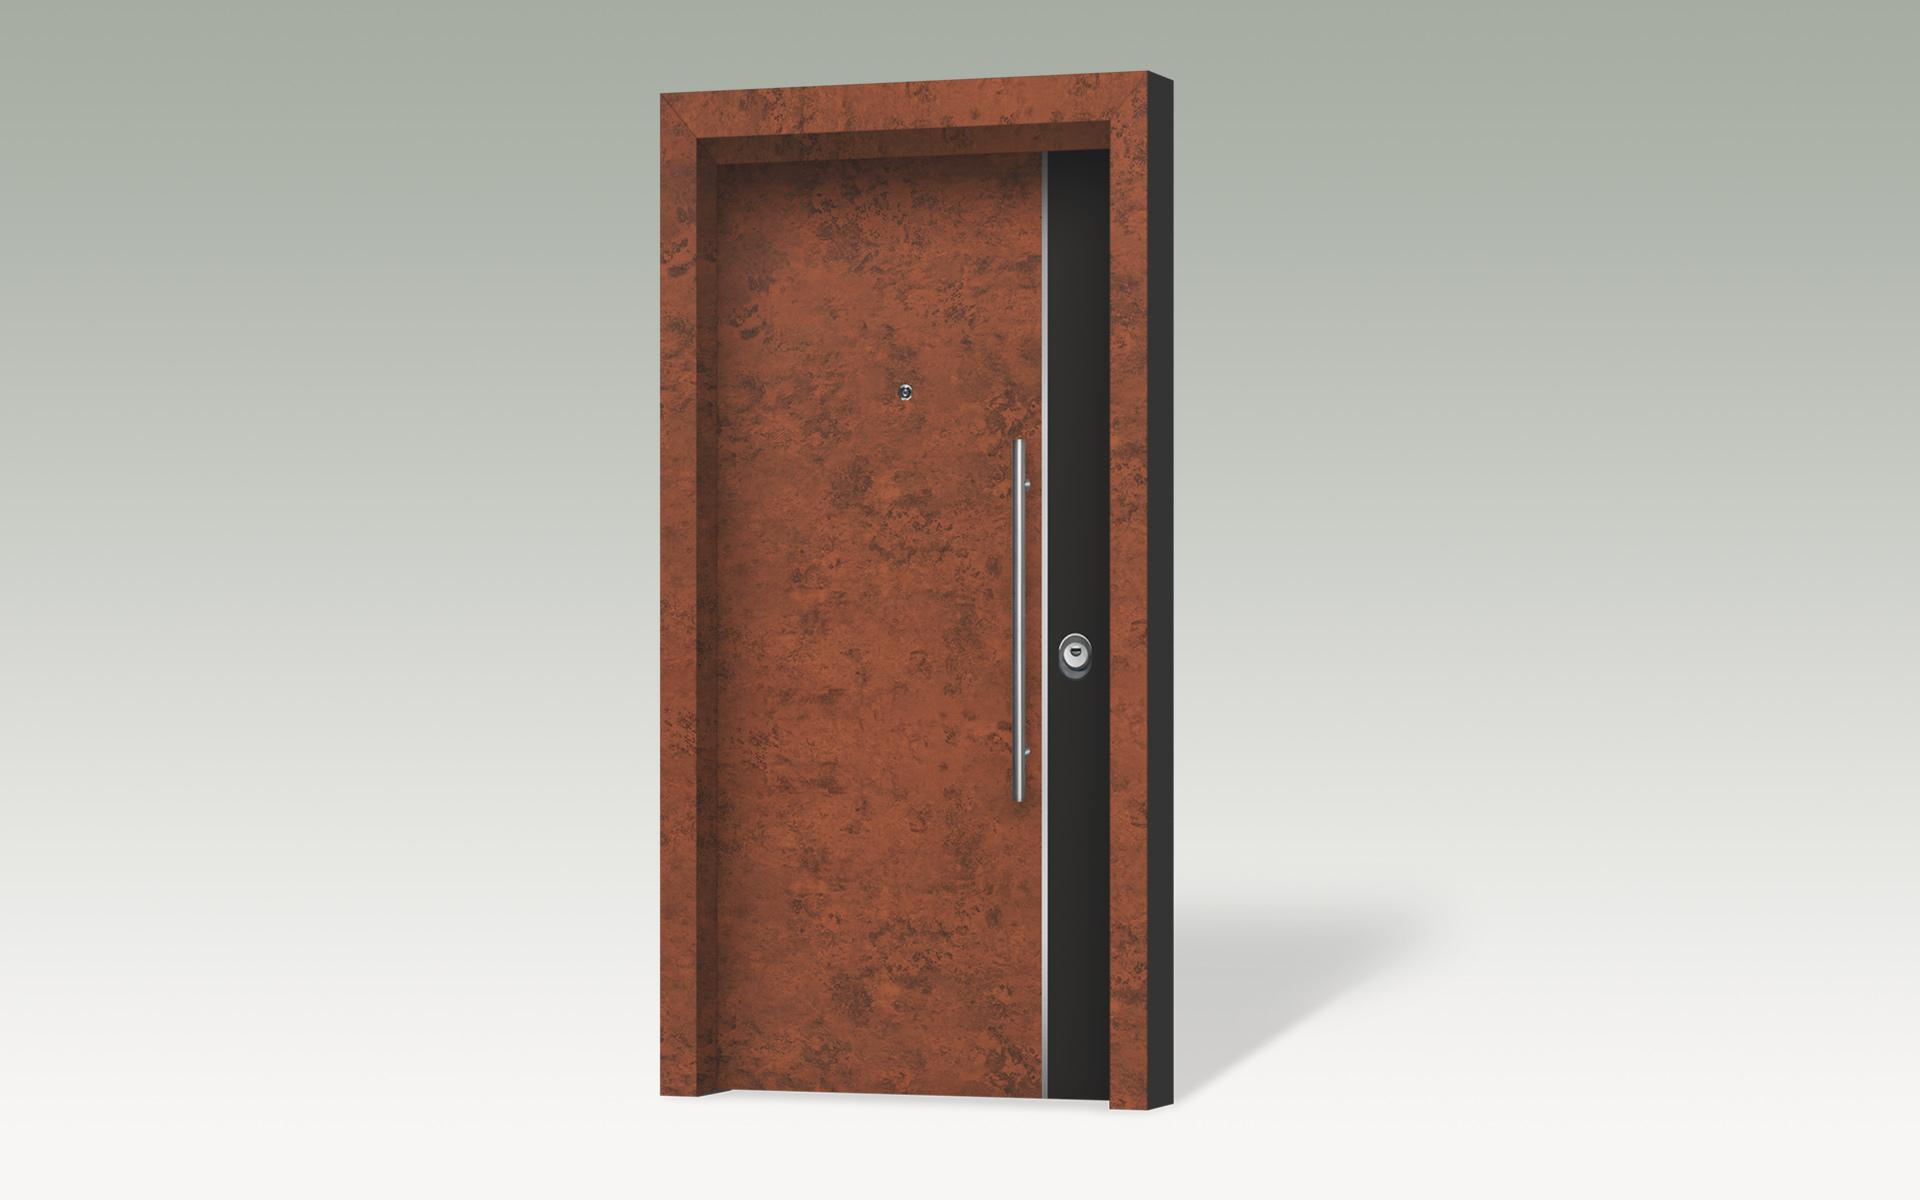 12-porta-BO-309-D-new-color